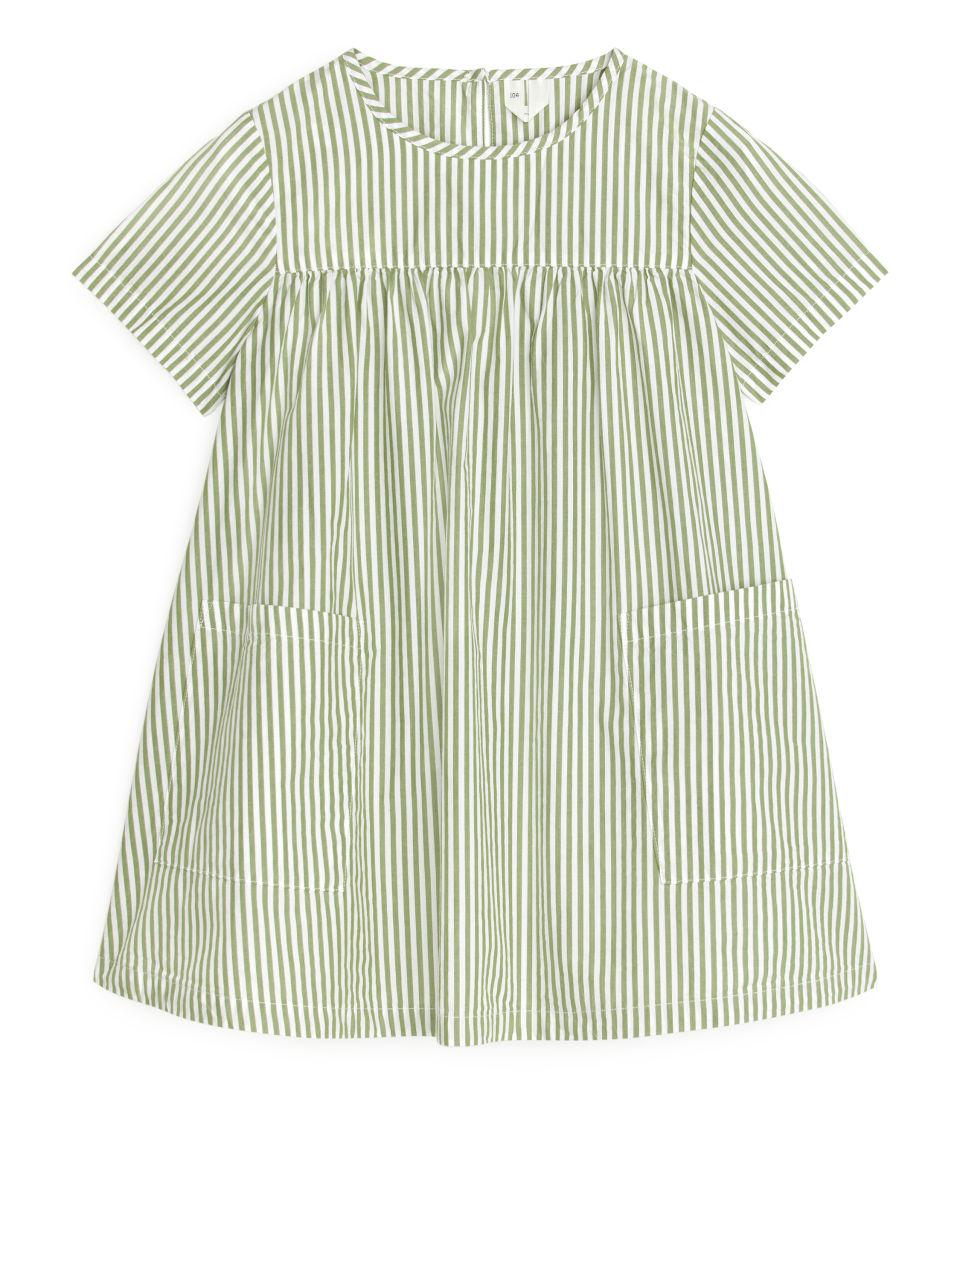 Pima Cotton Poplin Dress - Green